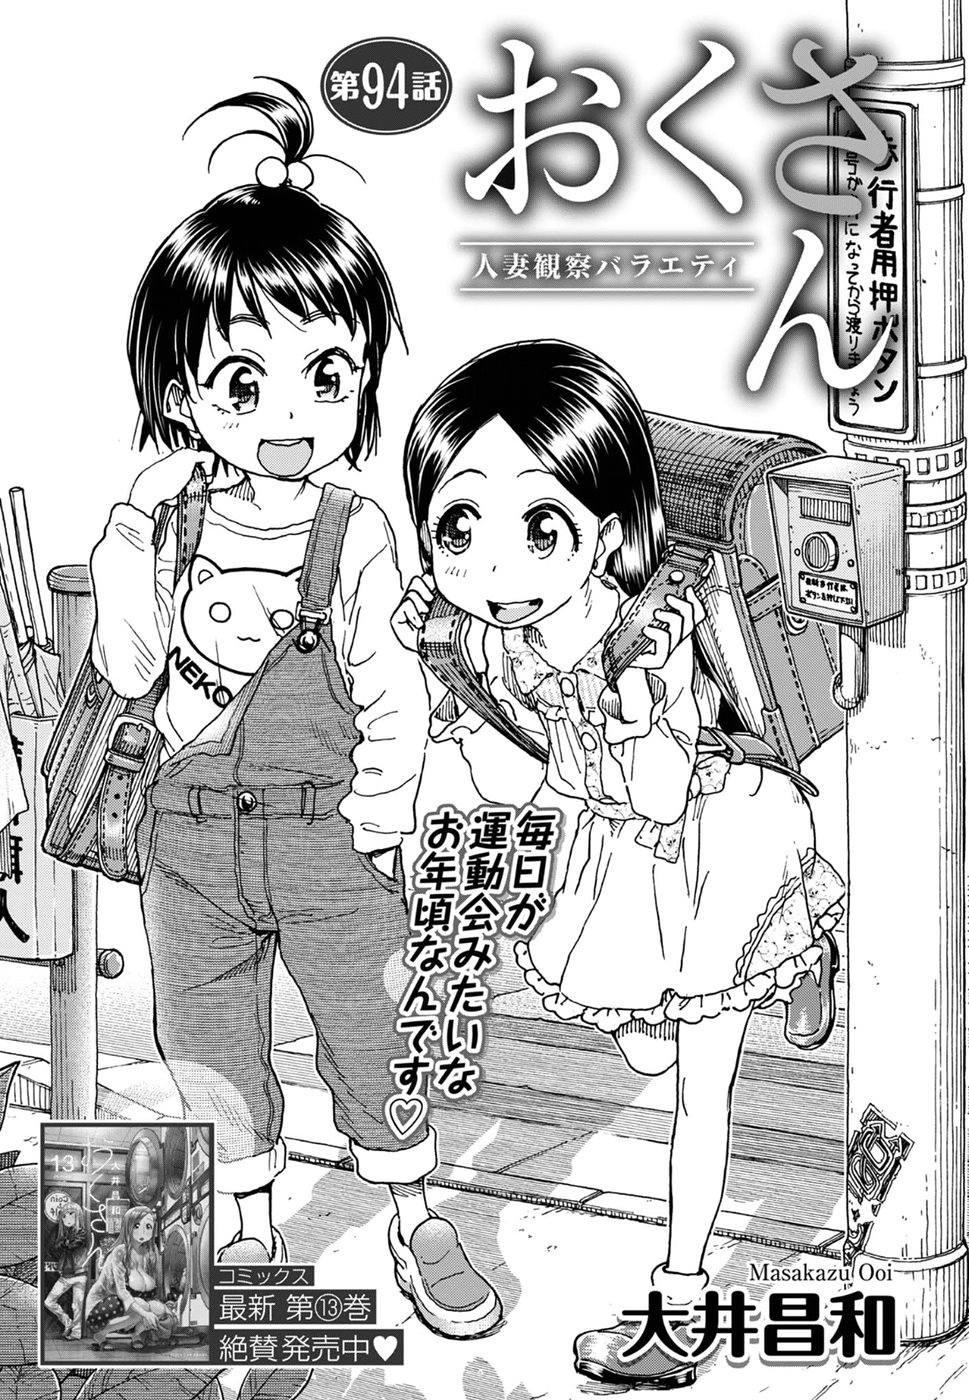 Okusan Chapter 94 Page 1